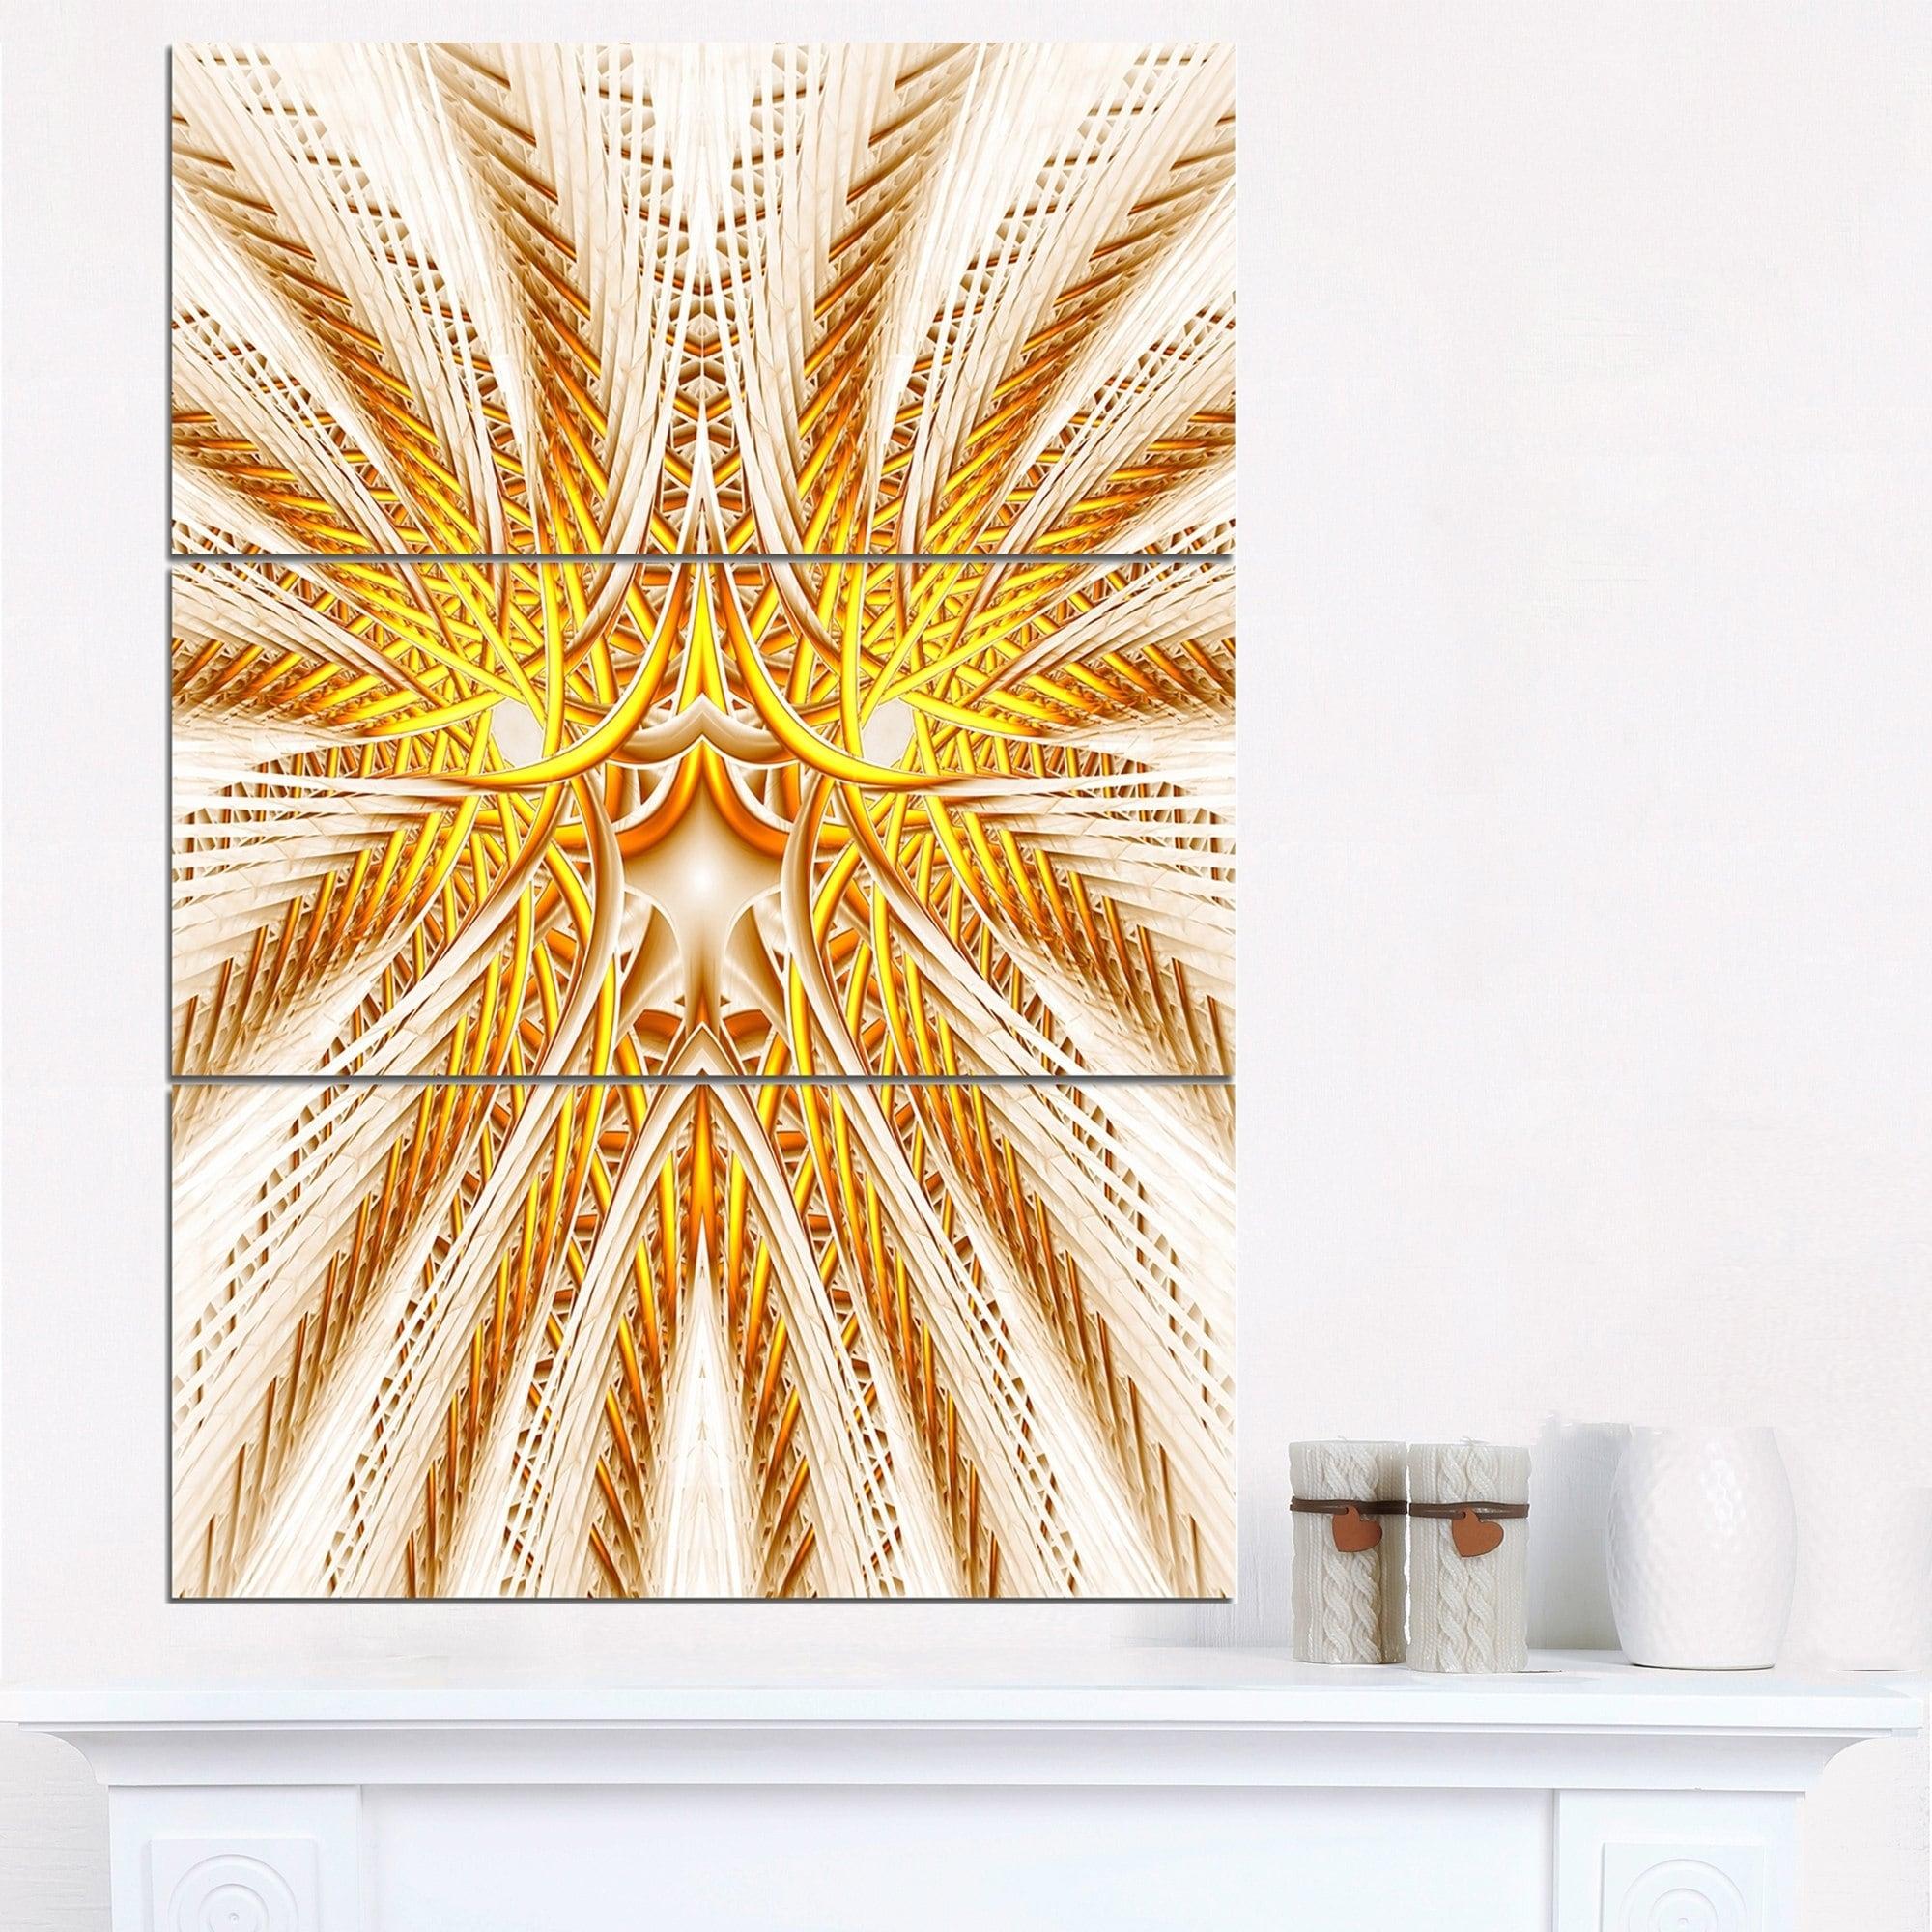 Modern Herbst Metal Wall Art Image - All About Wallart - adelgazare.info